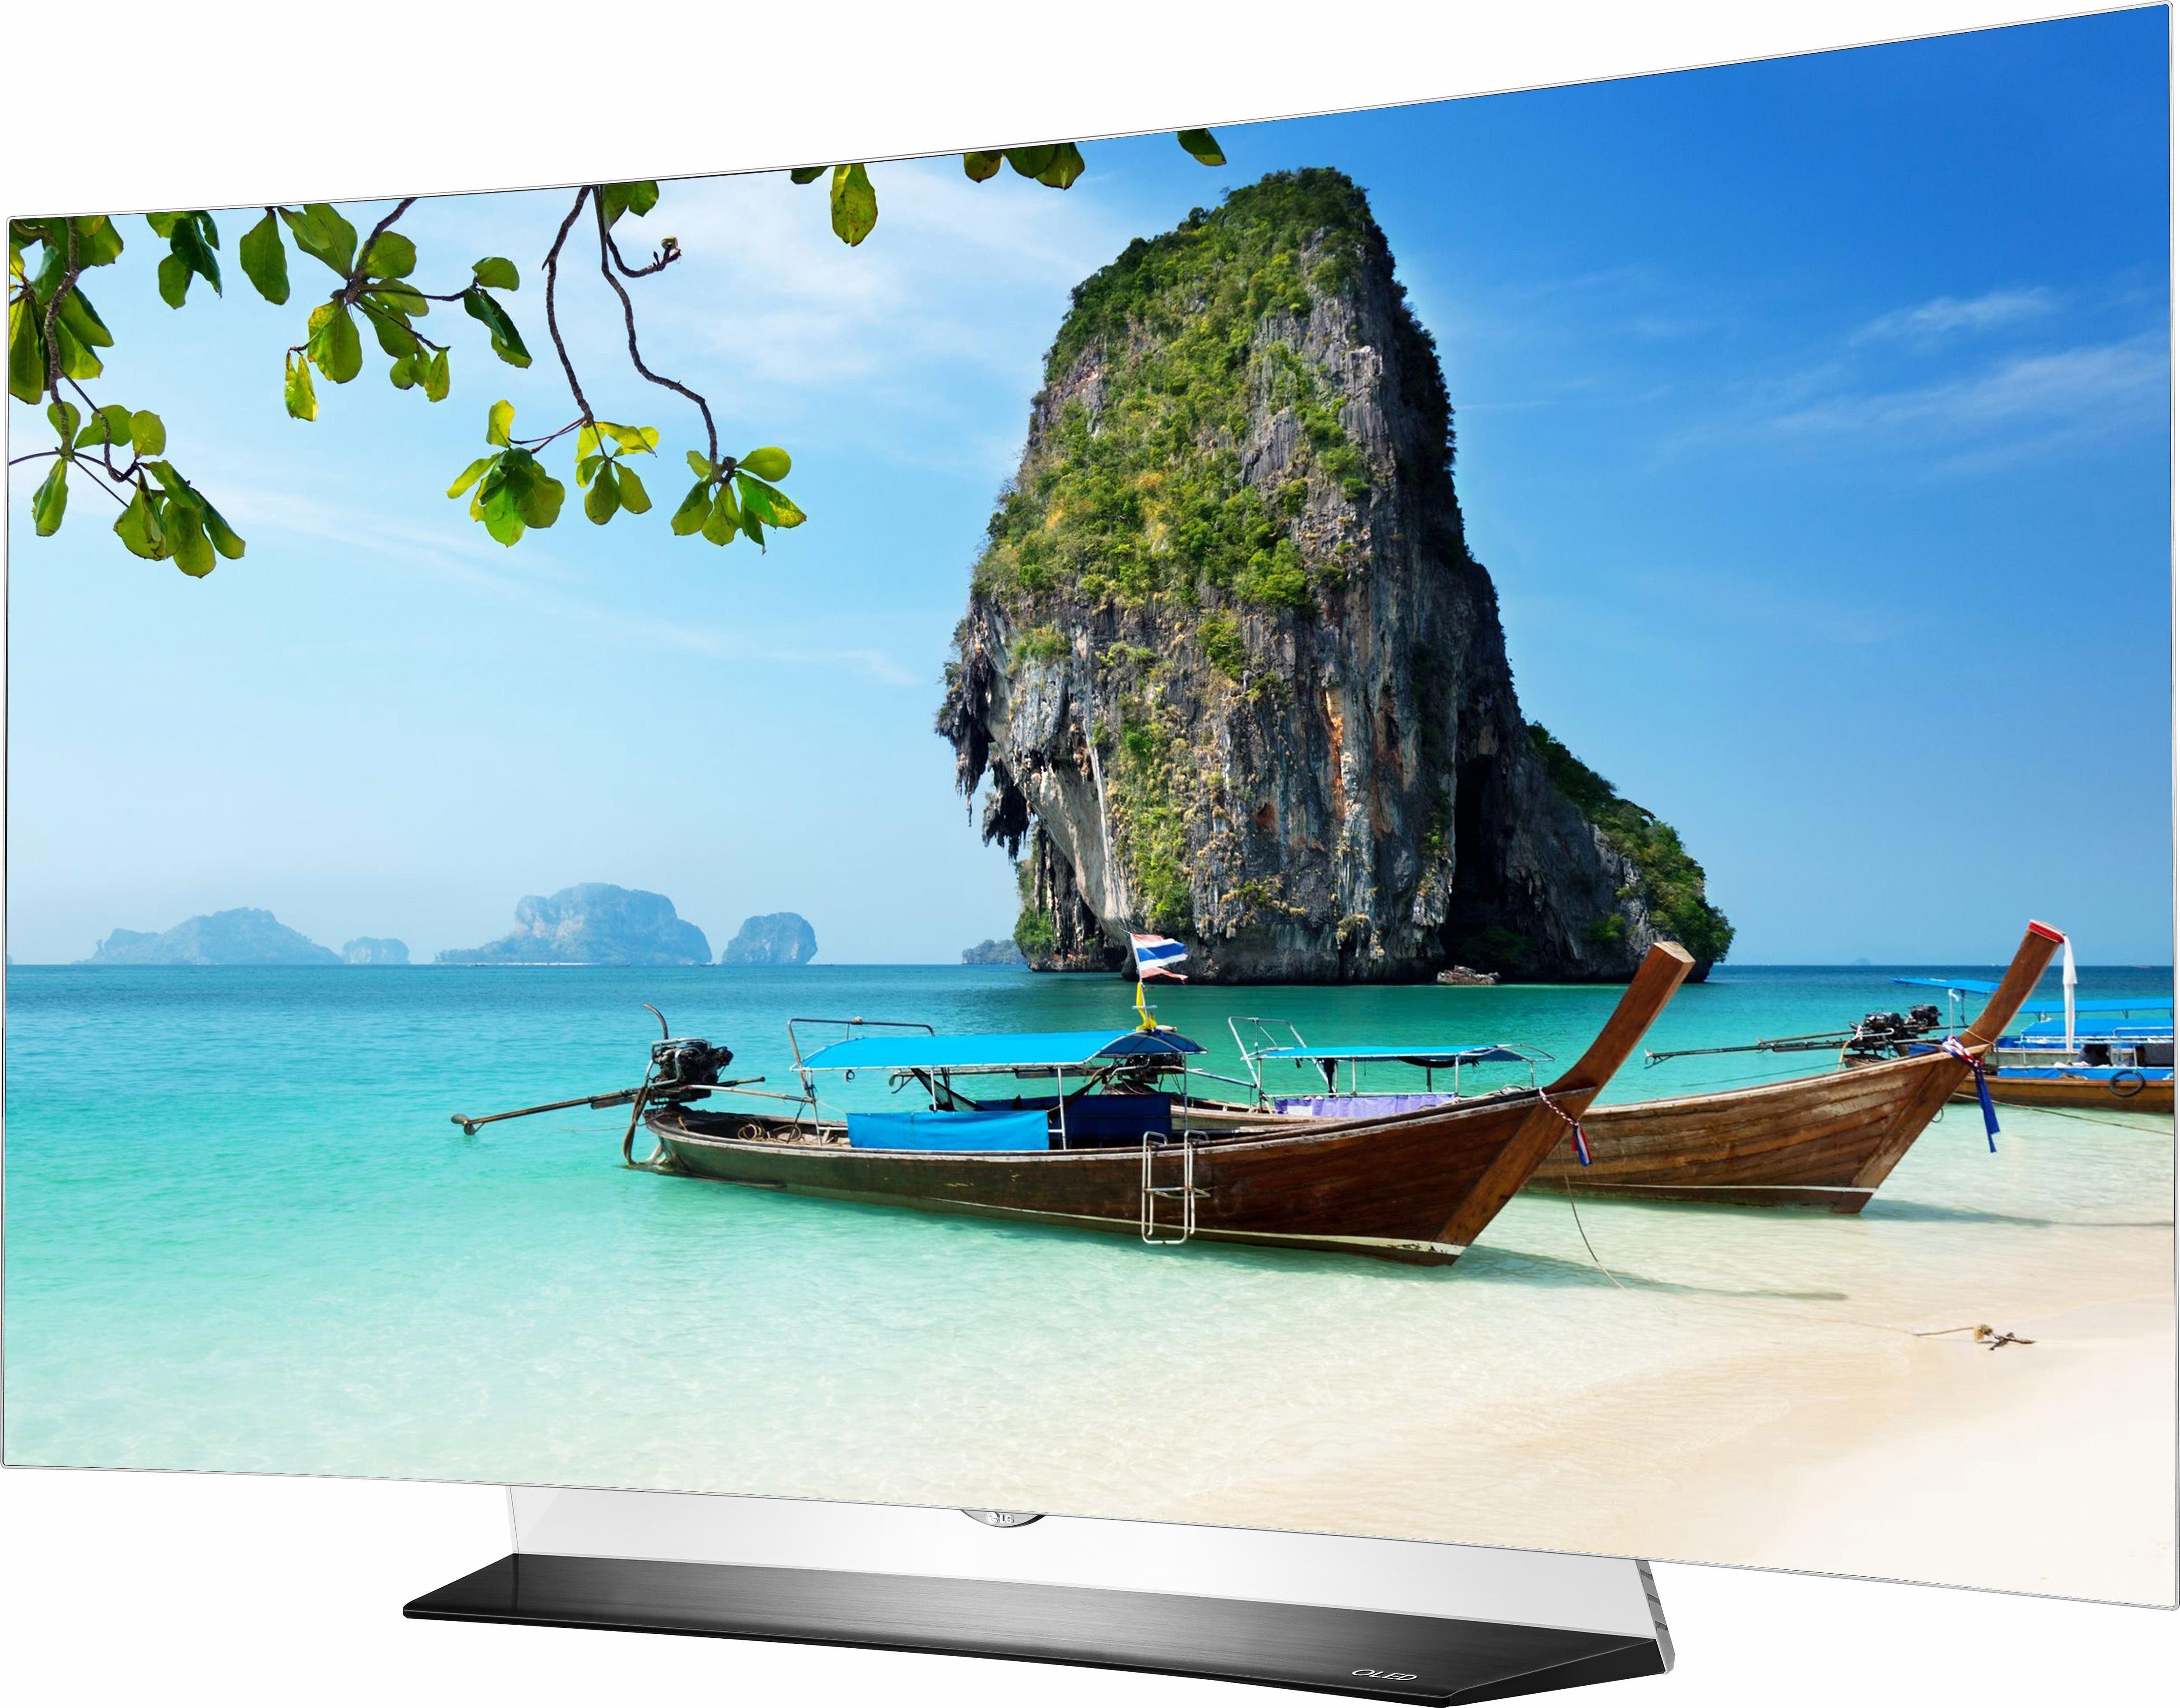 LG OLED55C6D, Curved-OLED-Fernseher, 139 cm (55 Zoll), 2160p (4K Ultra HD), Smart-TV